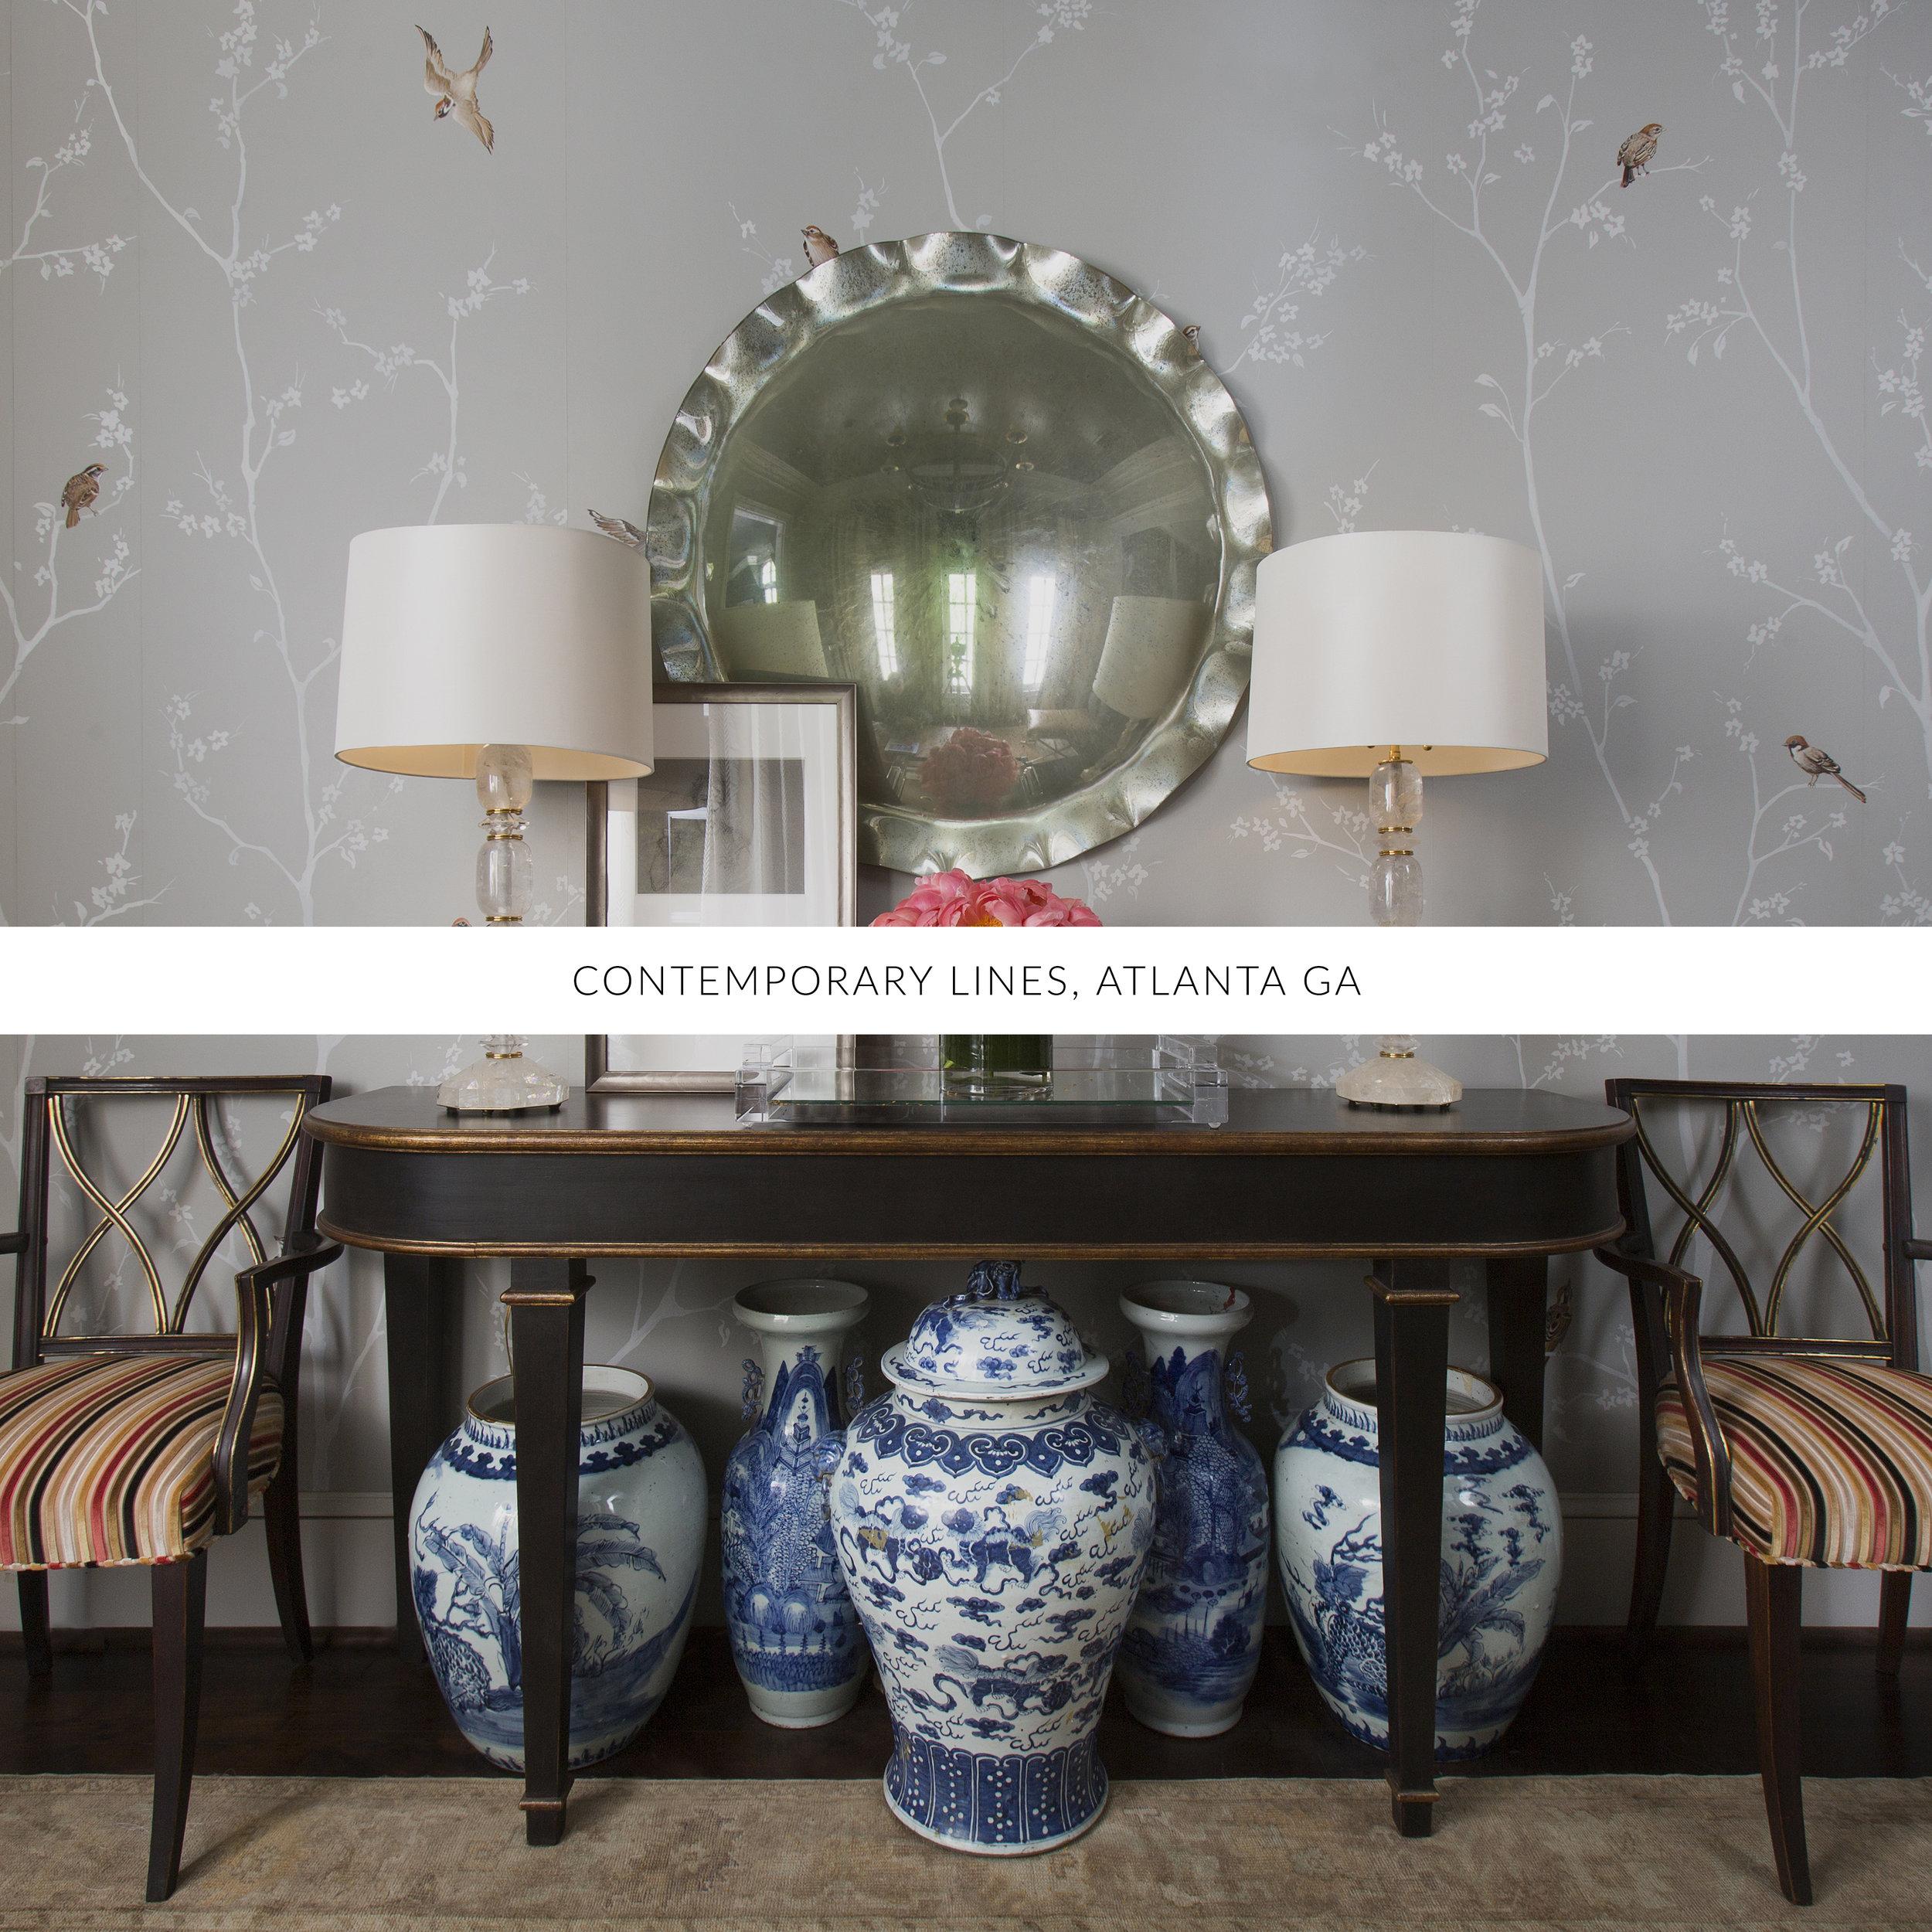 © Contemporary Lines, Traci Rhoads Interior Design, Private Residences and Country Clubs, Atlanta, GA